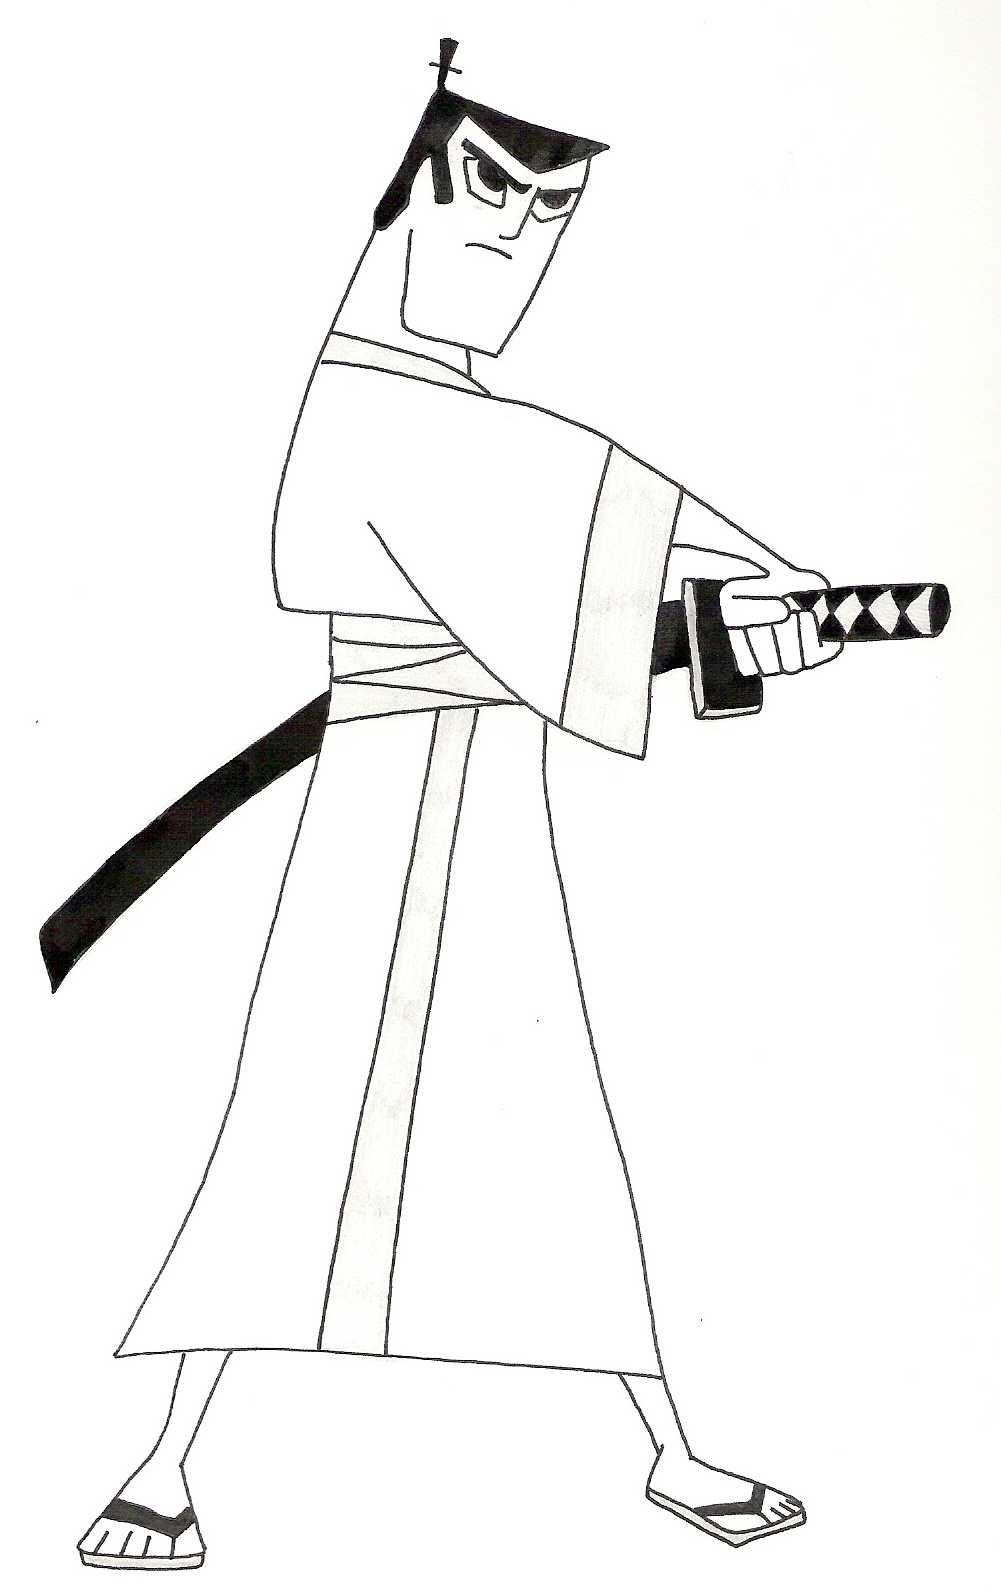 Samurai Jack, dibujito animado cubista, o con muchas